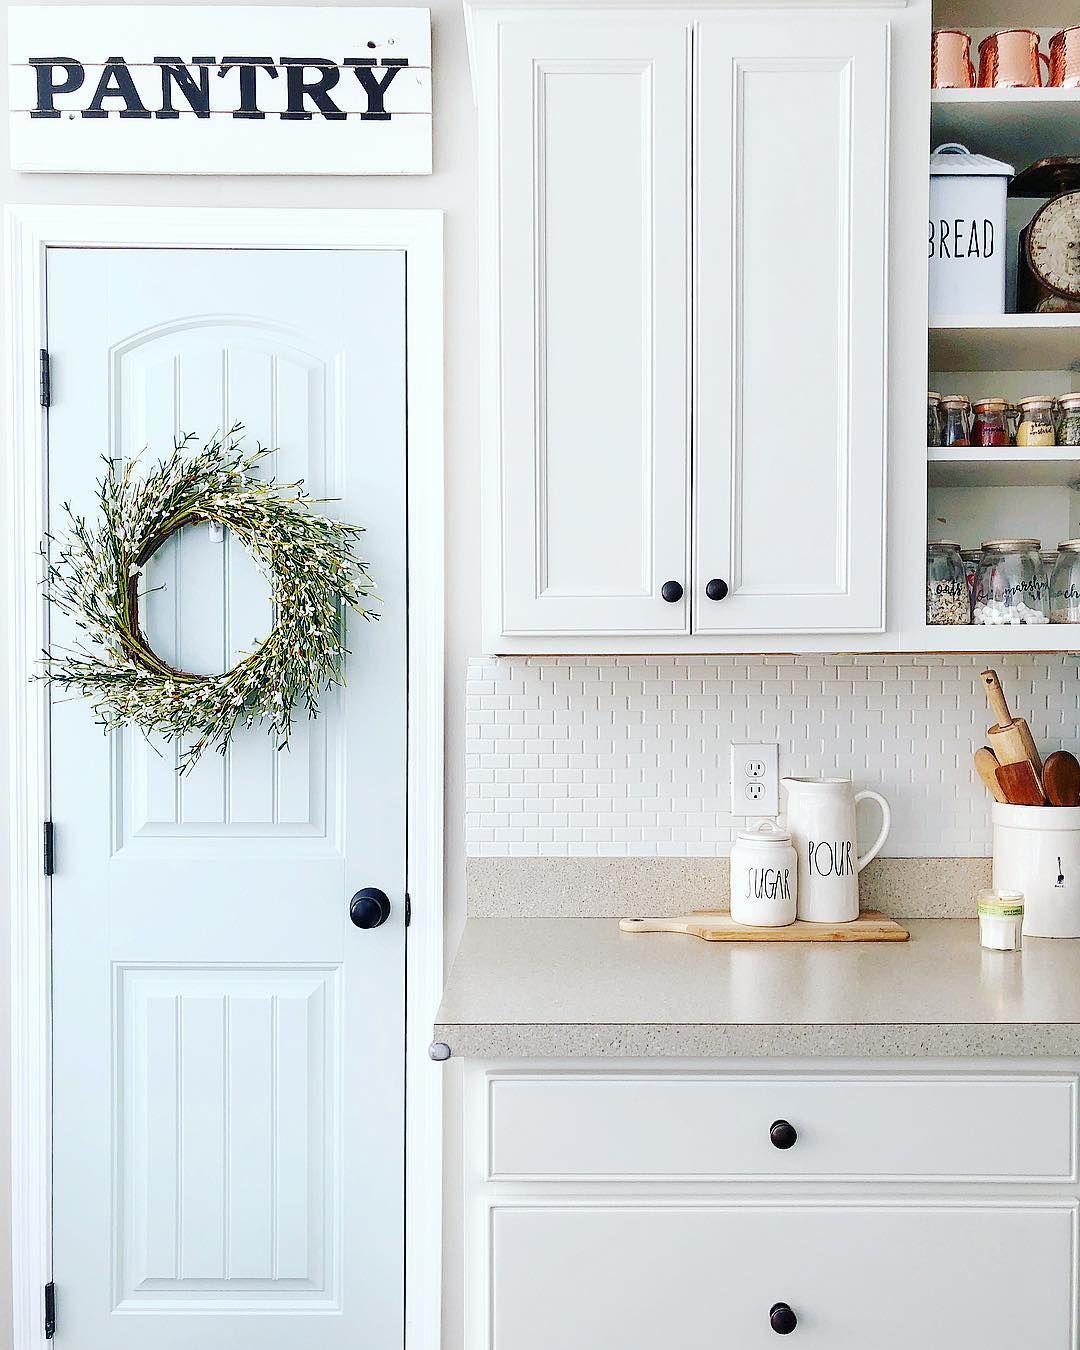 Sherwin Williams Sea Salt kitchen door | Best Sherwin Williams Paint ...